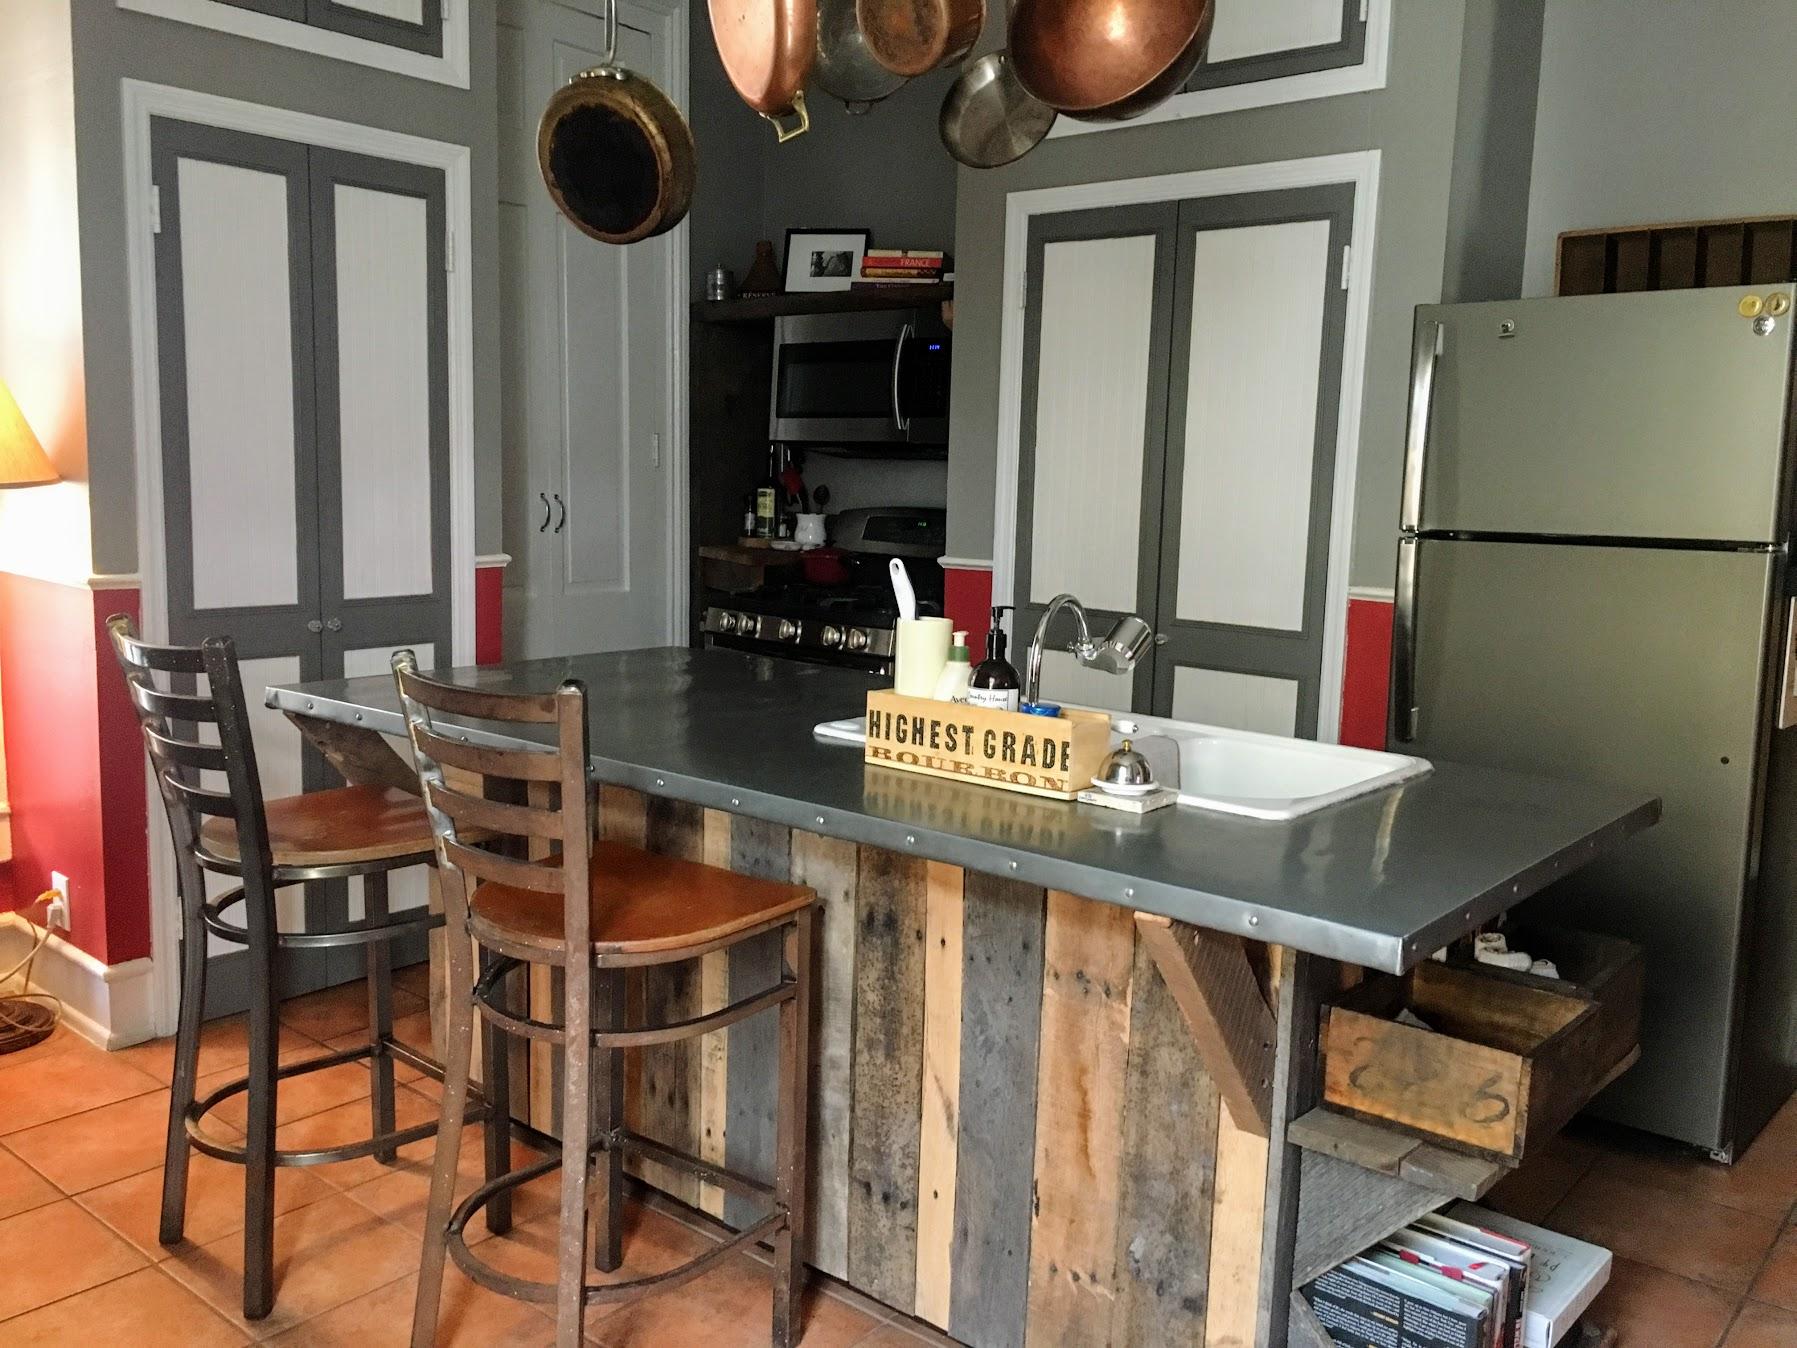 Countertop Refinishing - Cheap Countertop Ideas | Apartment Therapy